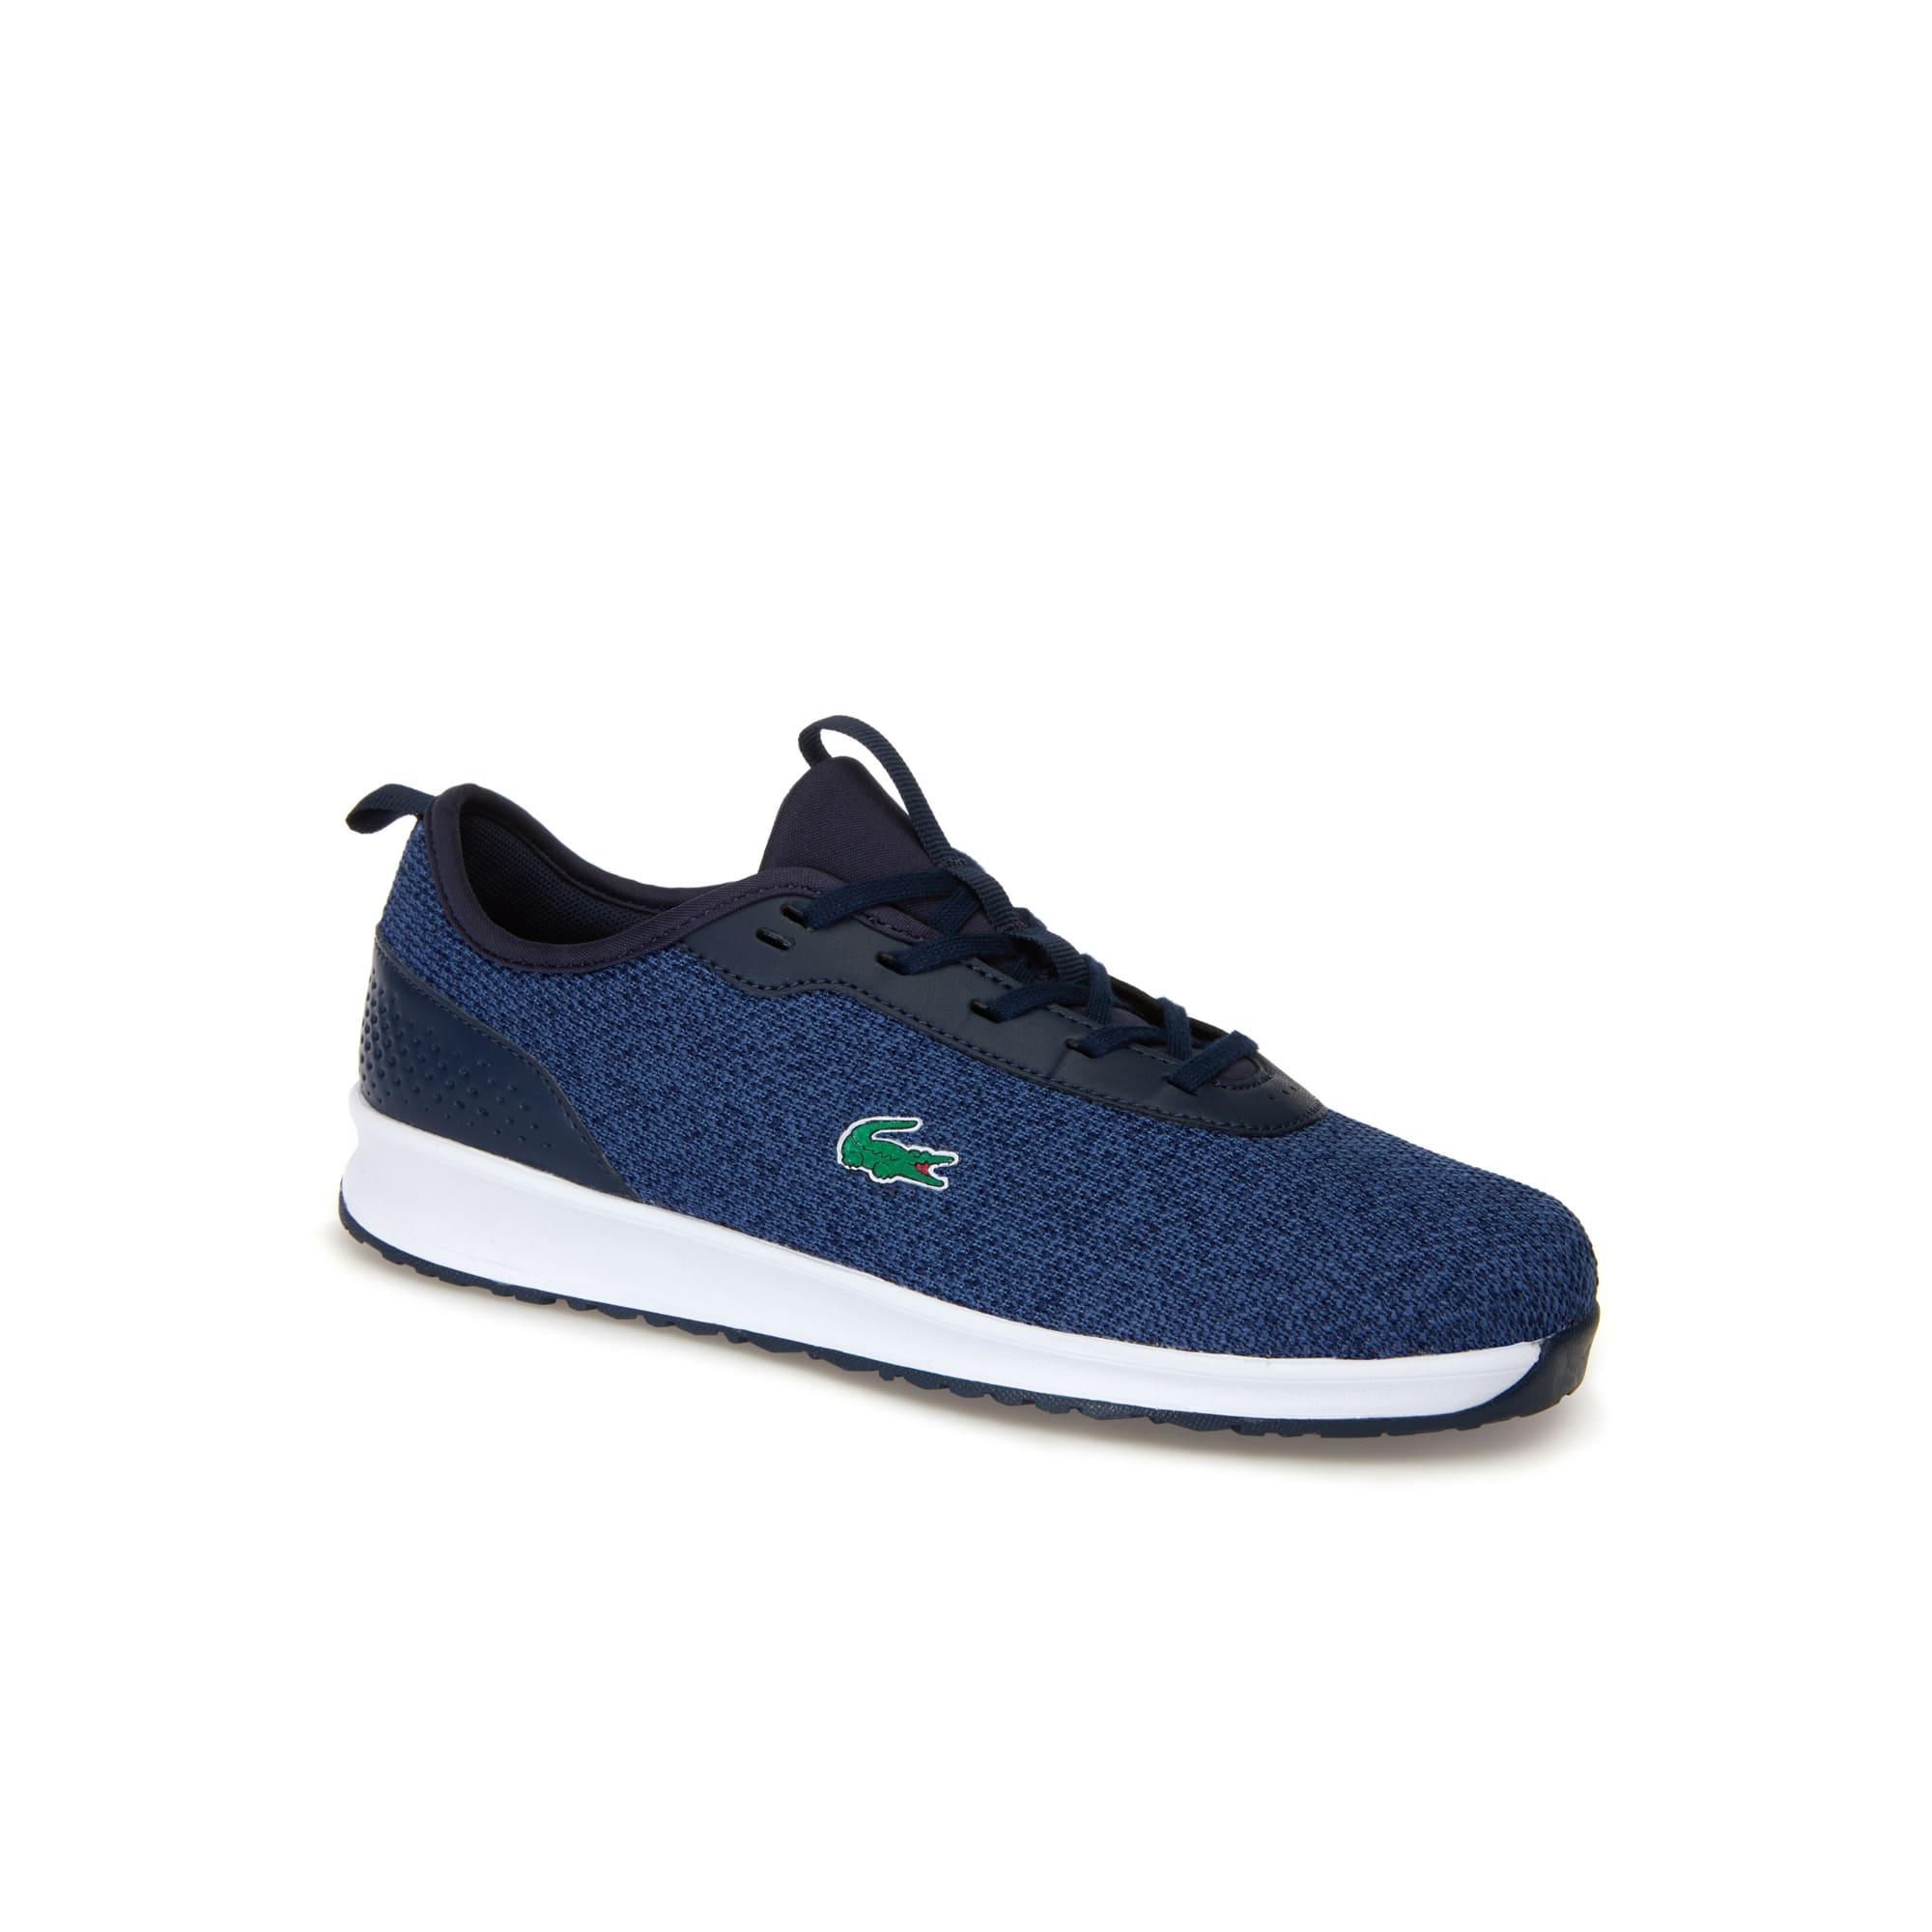 Sneakers LT Spirit 2.0 enfant en textile